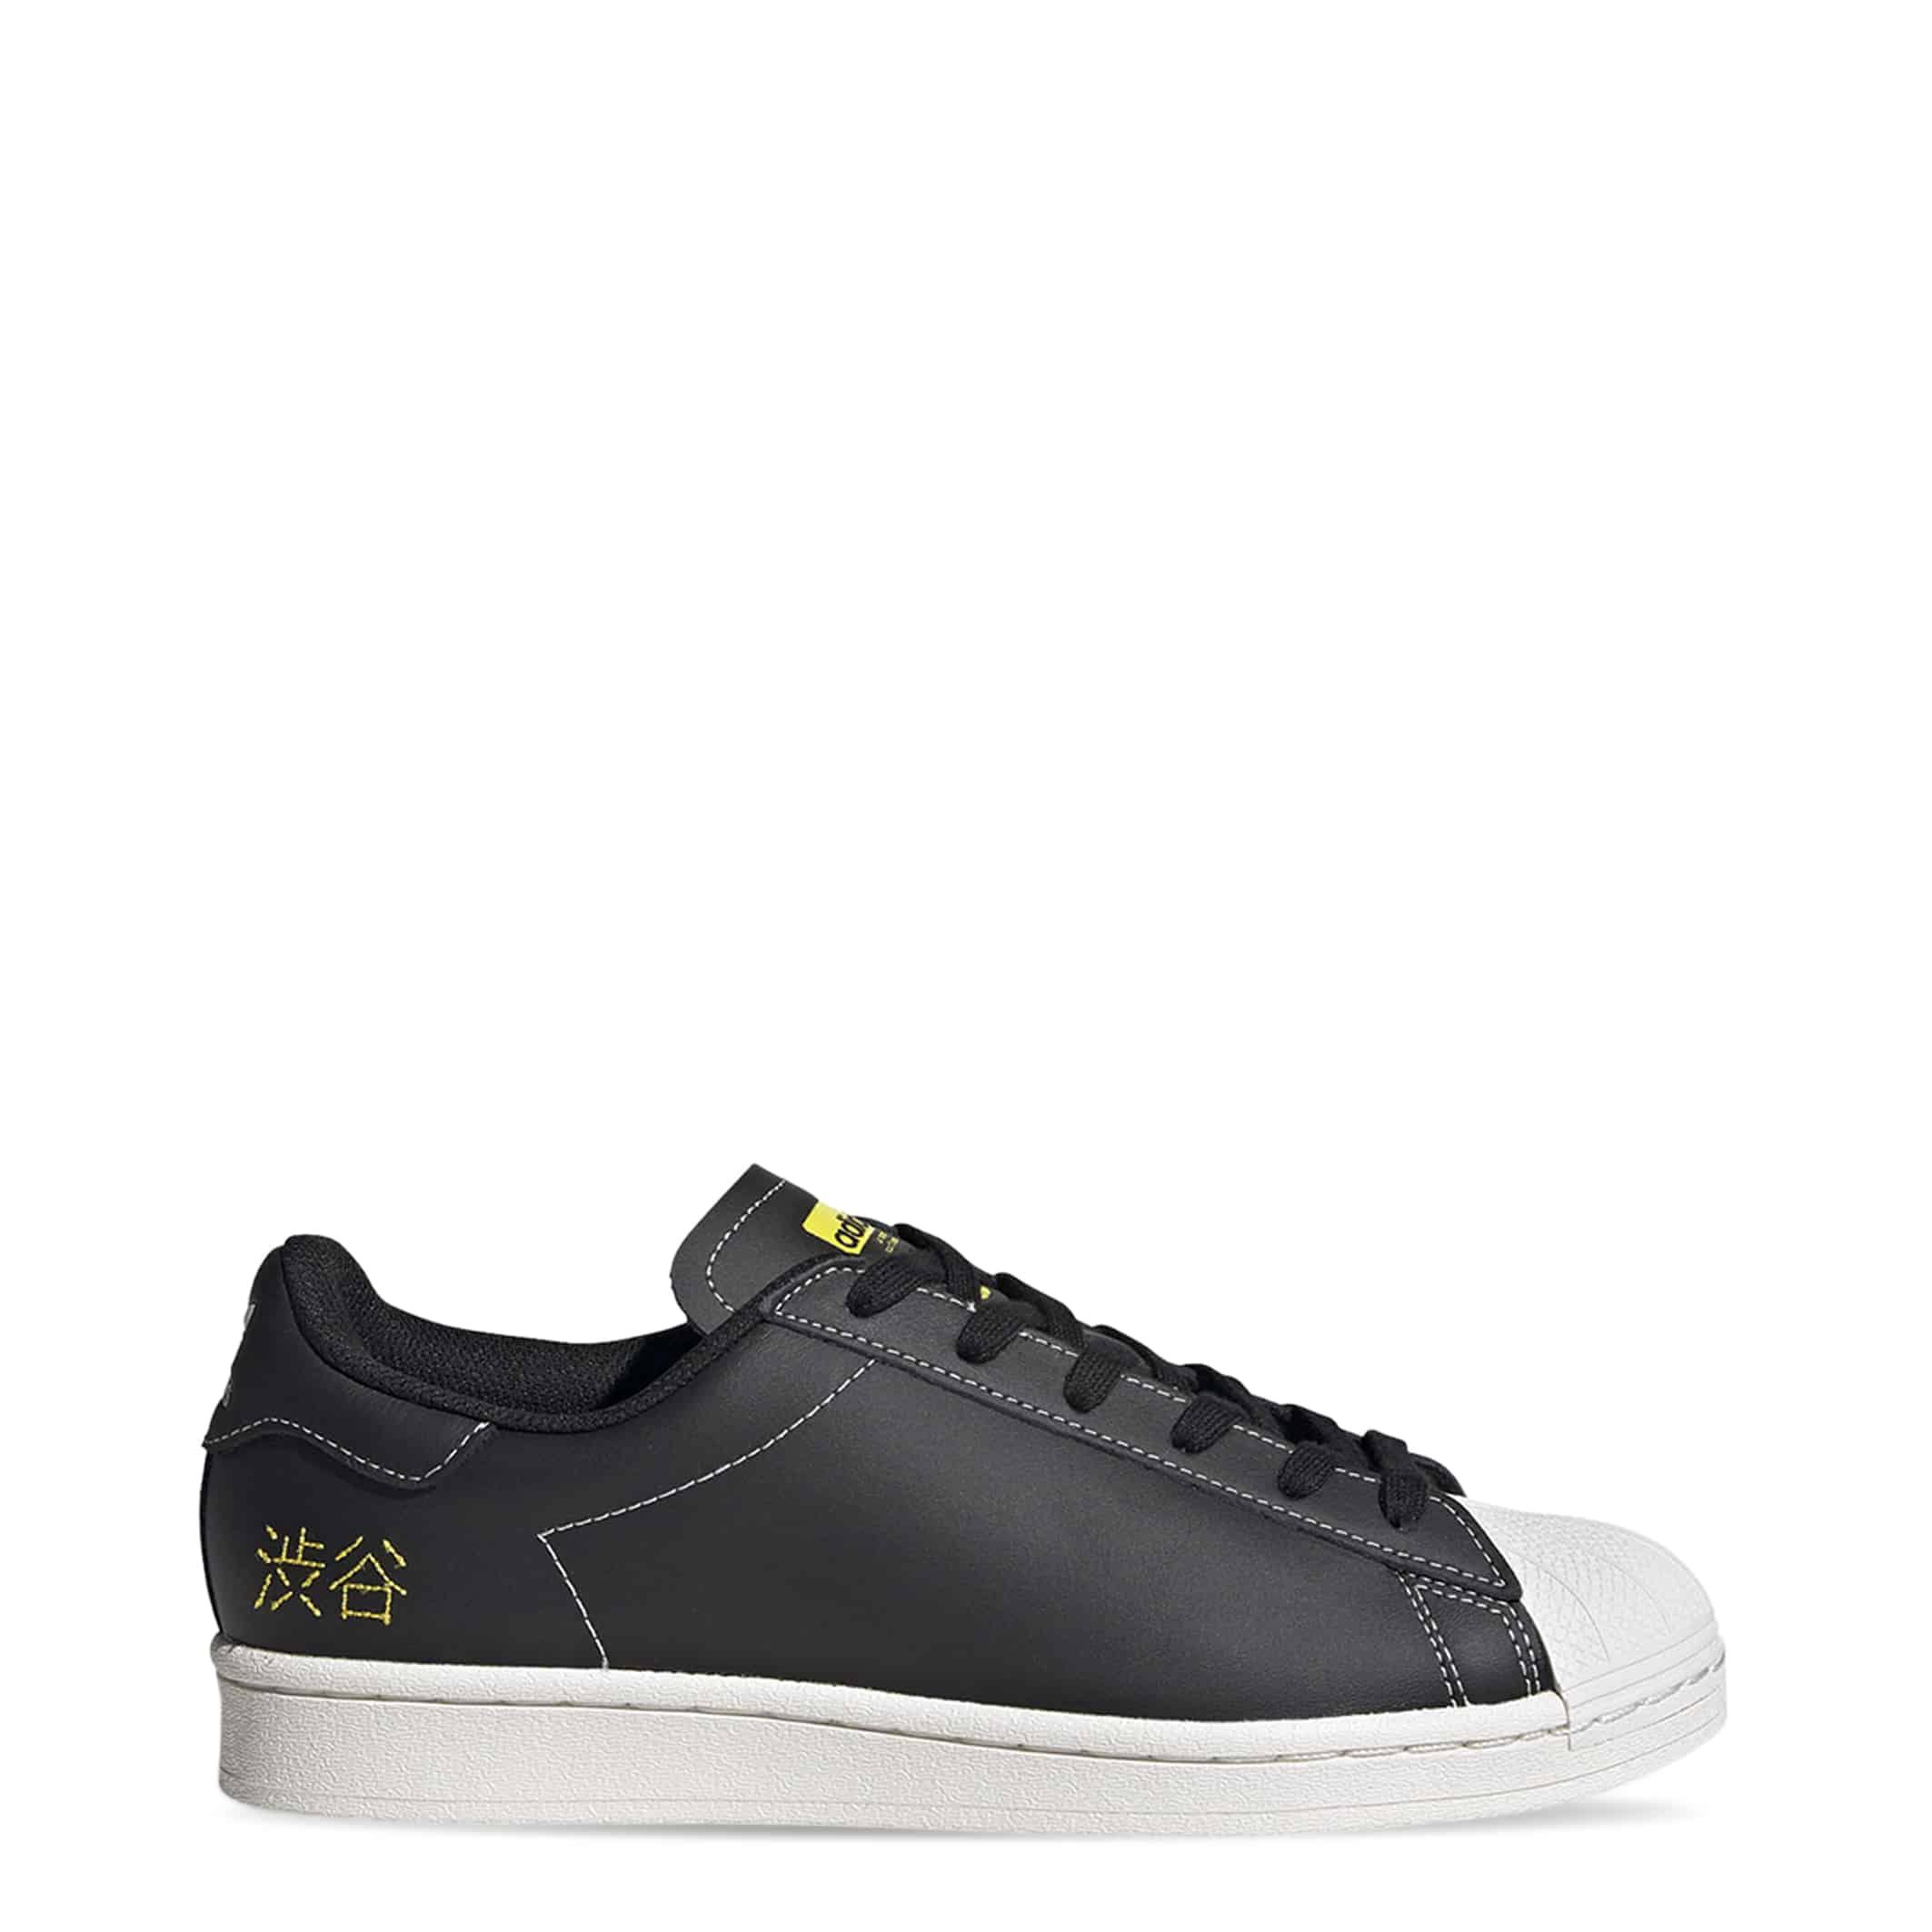 Schuhe Adidas – SuperstarPure